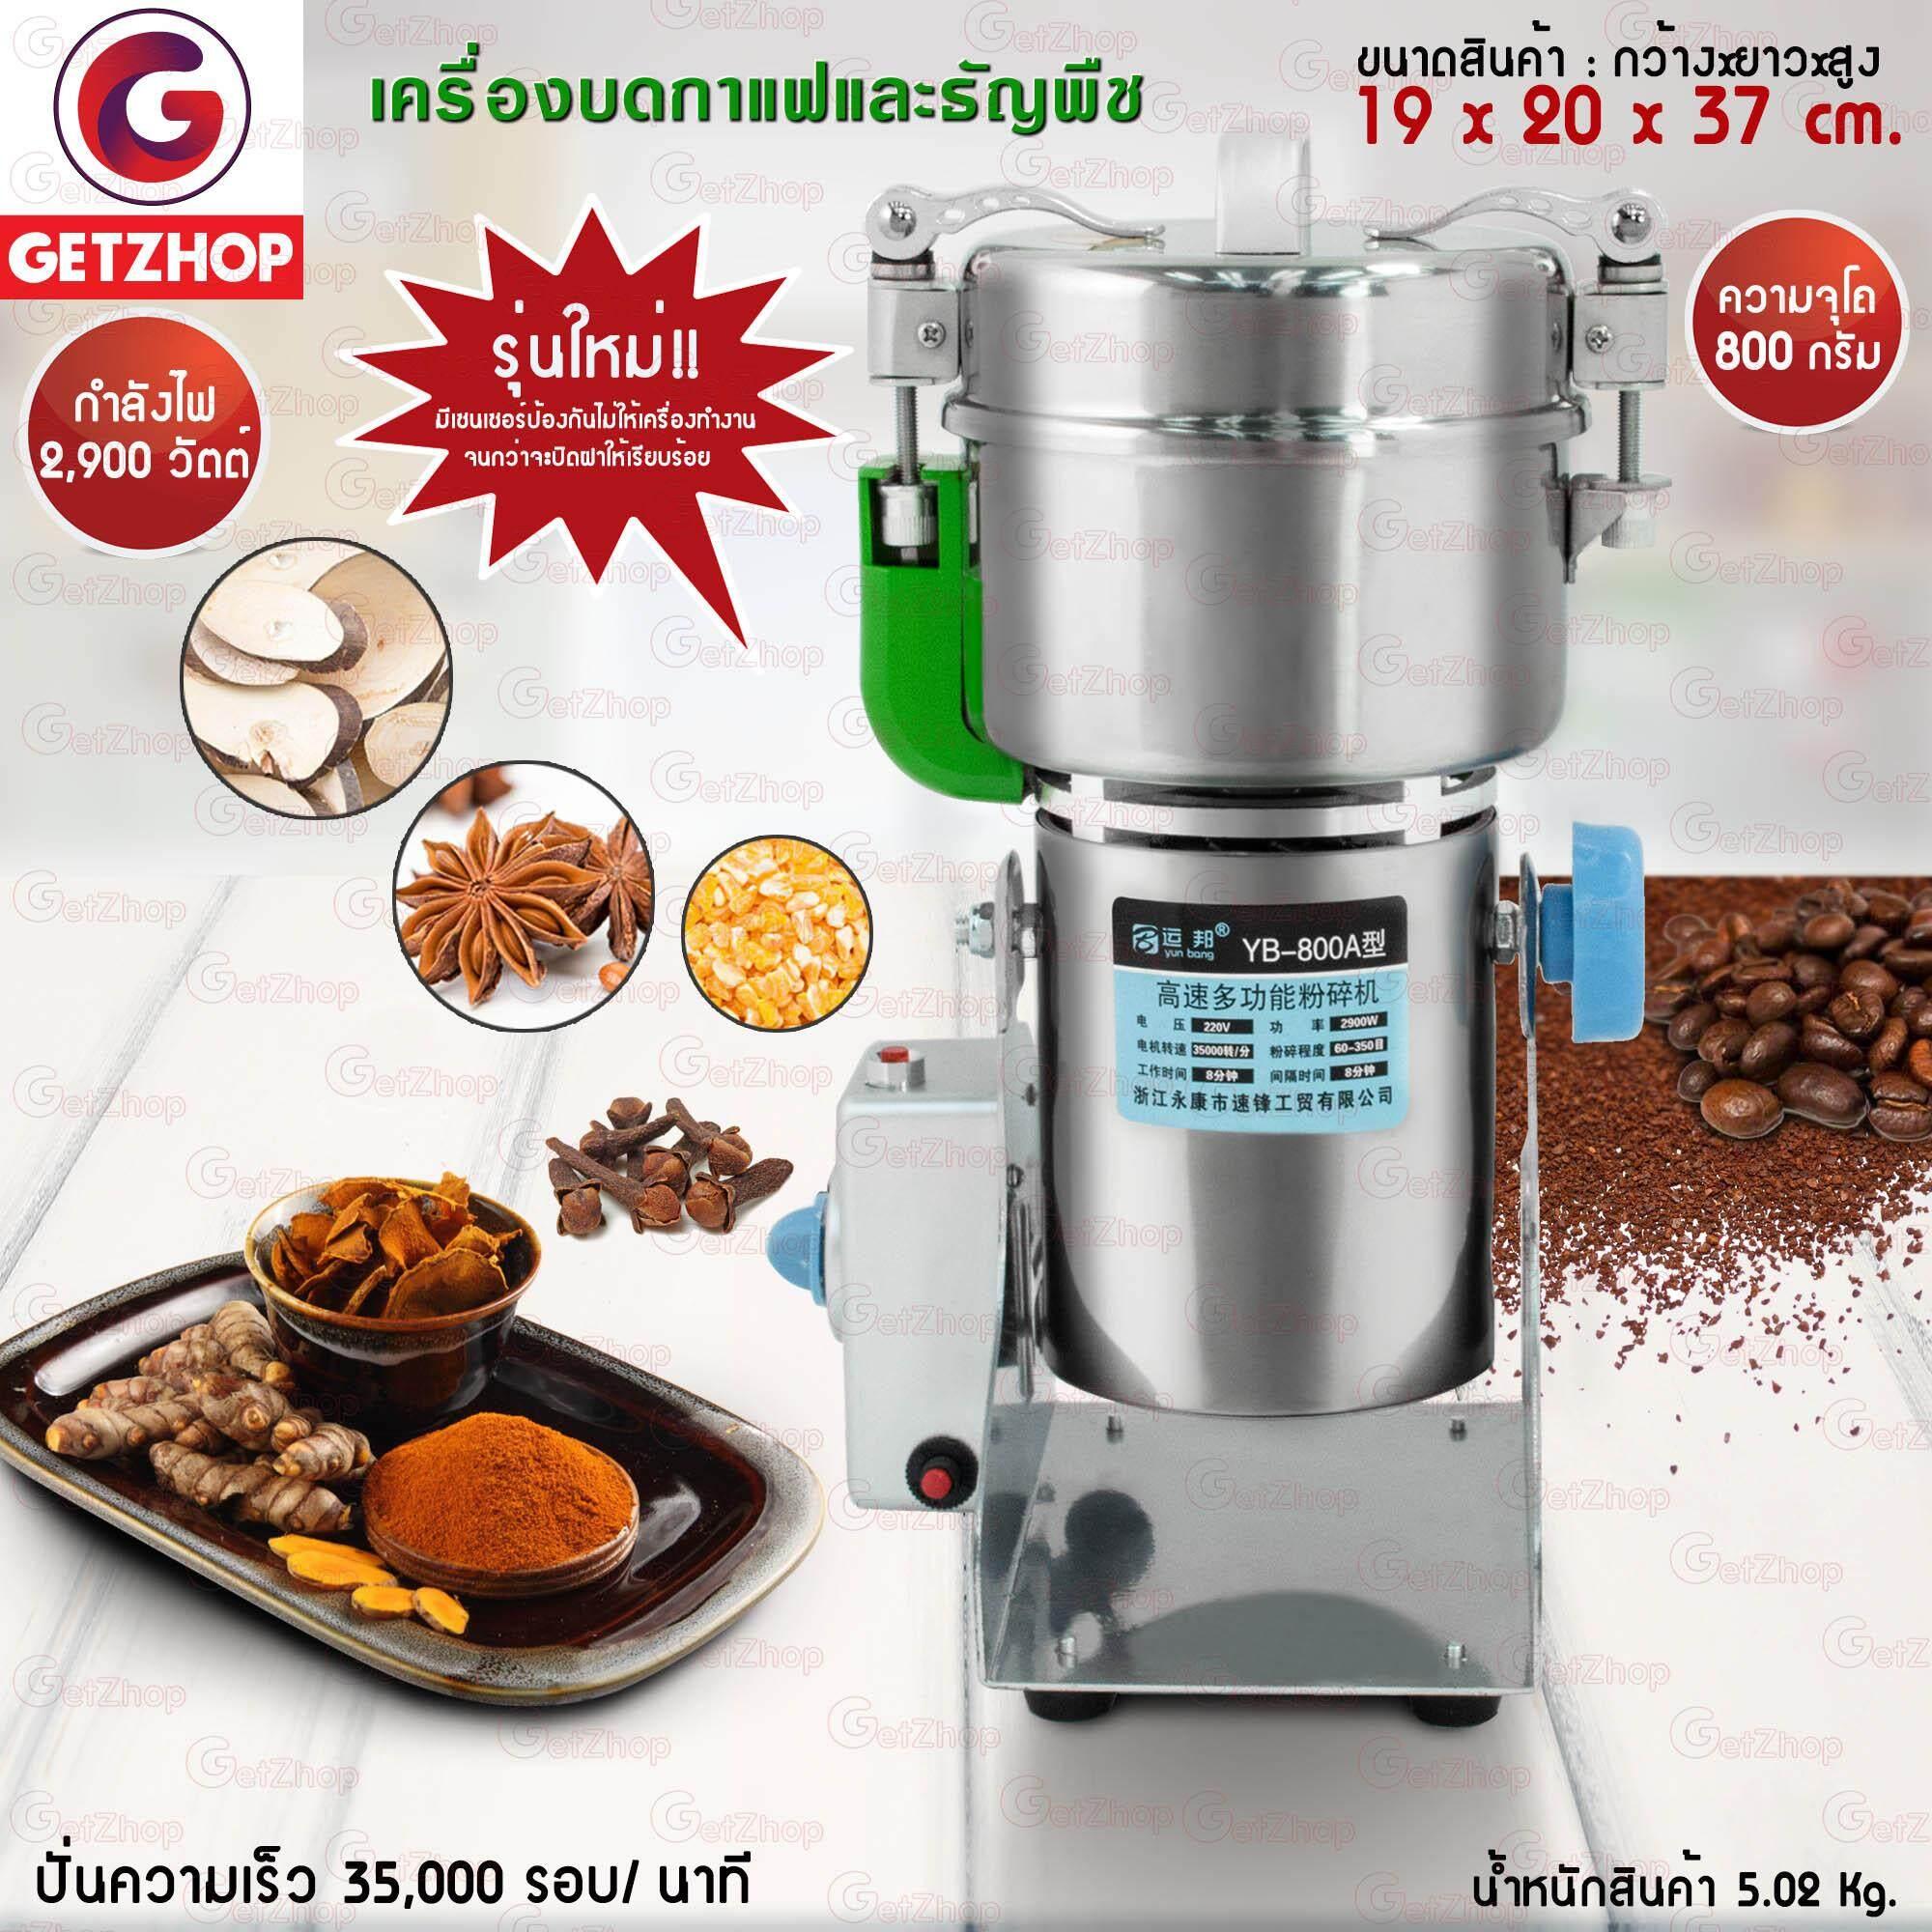 Thaibull เครื่องบดกาแฟและธัญพืช เครื่องบดอเนกประสงค์ บดของแห้ง สมุนไพร 800g กำลังไฟ  2,900 Watt Yun Bang รุ่น YB-800A (Stainless) รุ่นใหม่ !  รีวิว ดีที่สุด